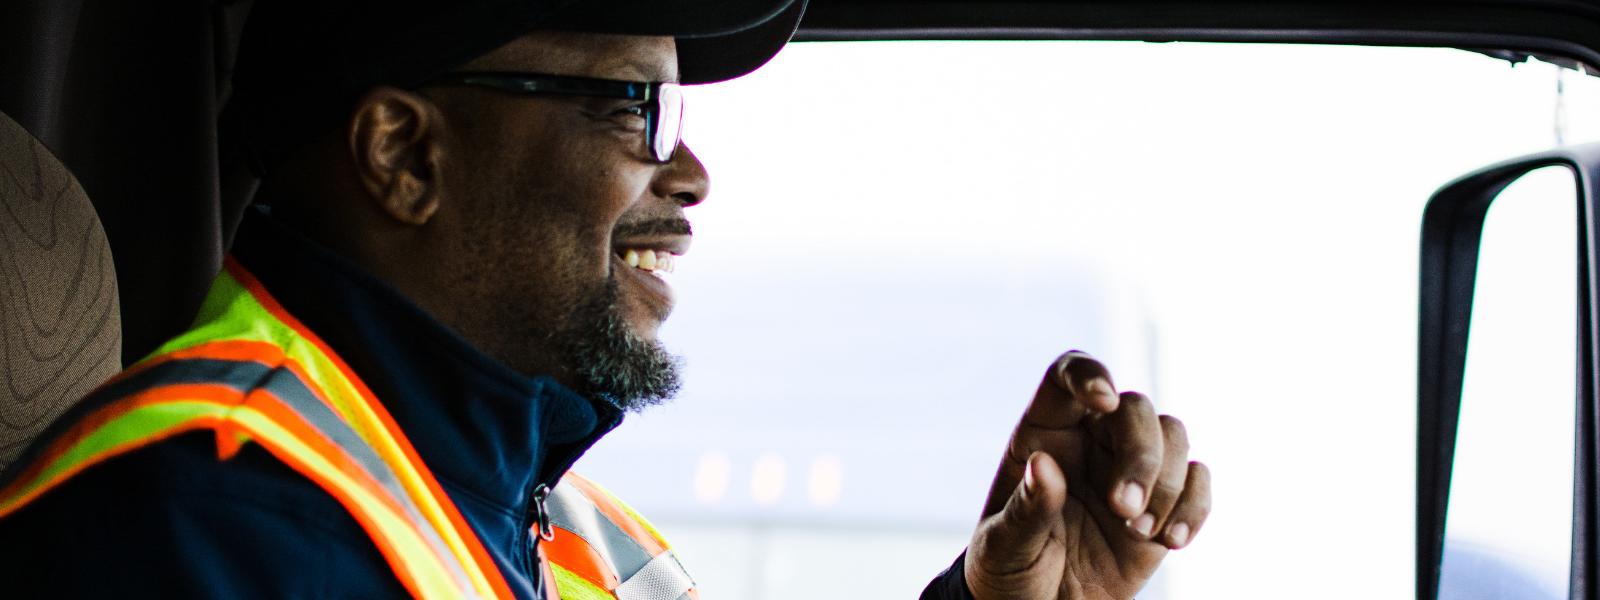 nfi-drivers-career-company-driver-hero